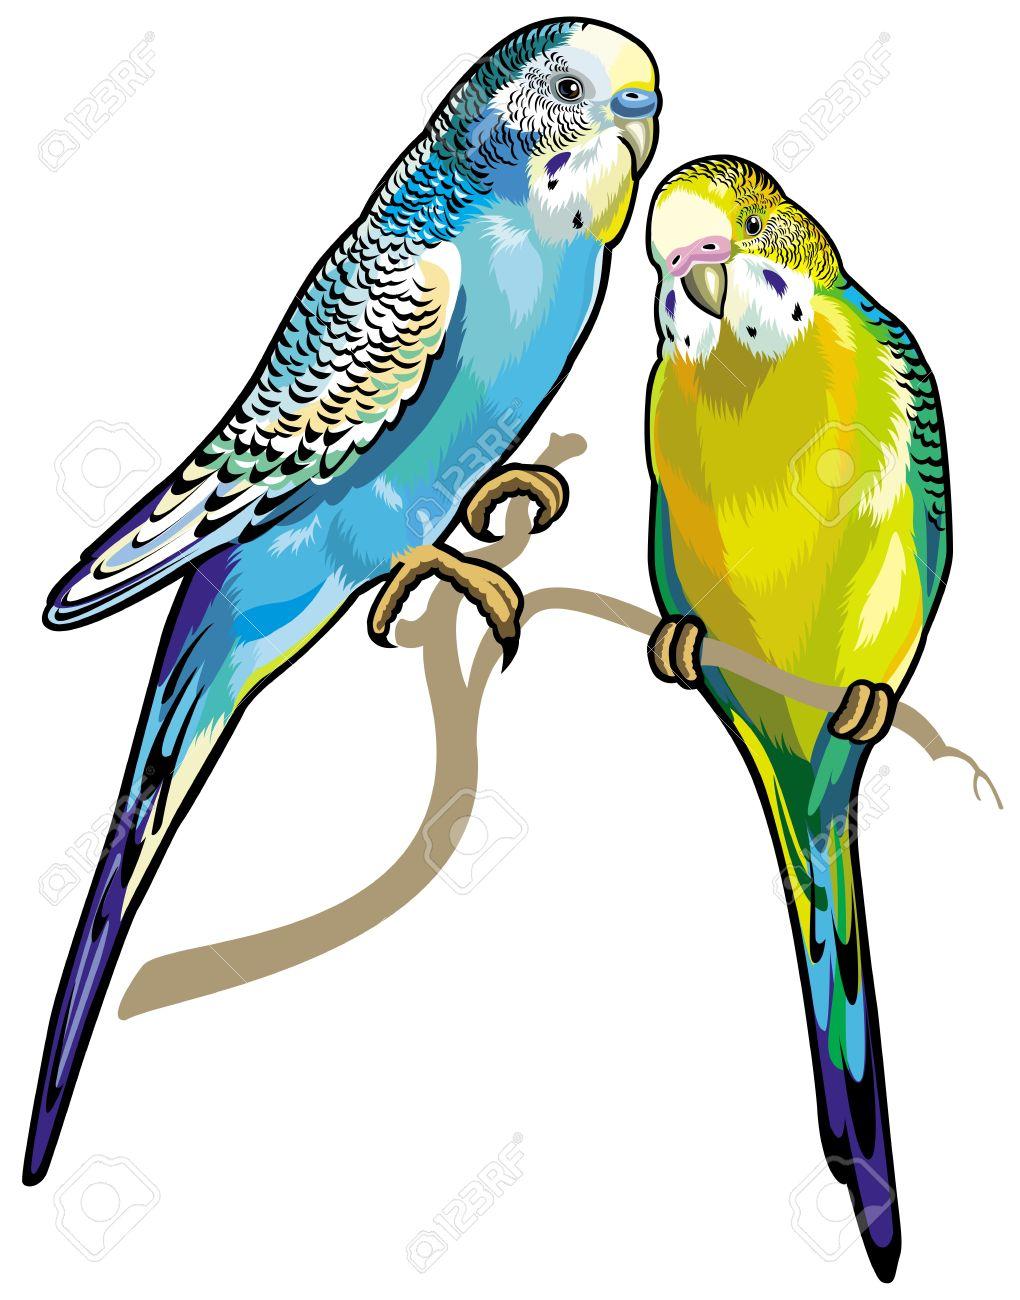 Budgie: Budgerigars Australian Parakeets-budgie: budgerigars australian parakeets isolated on white background Illustration-0